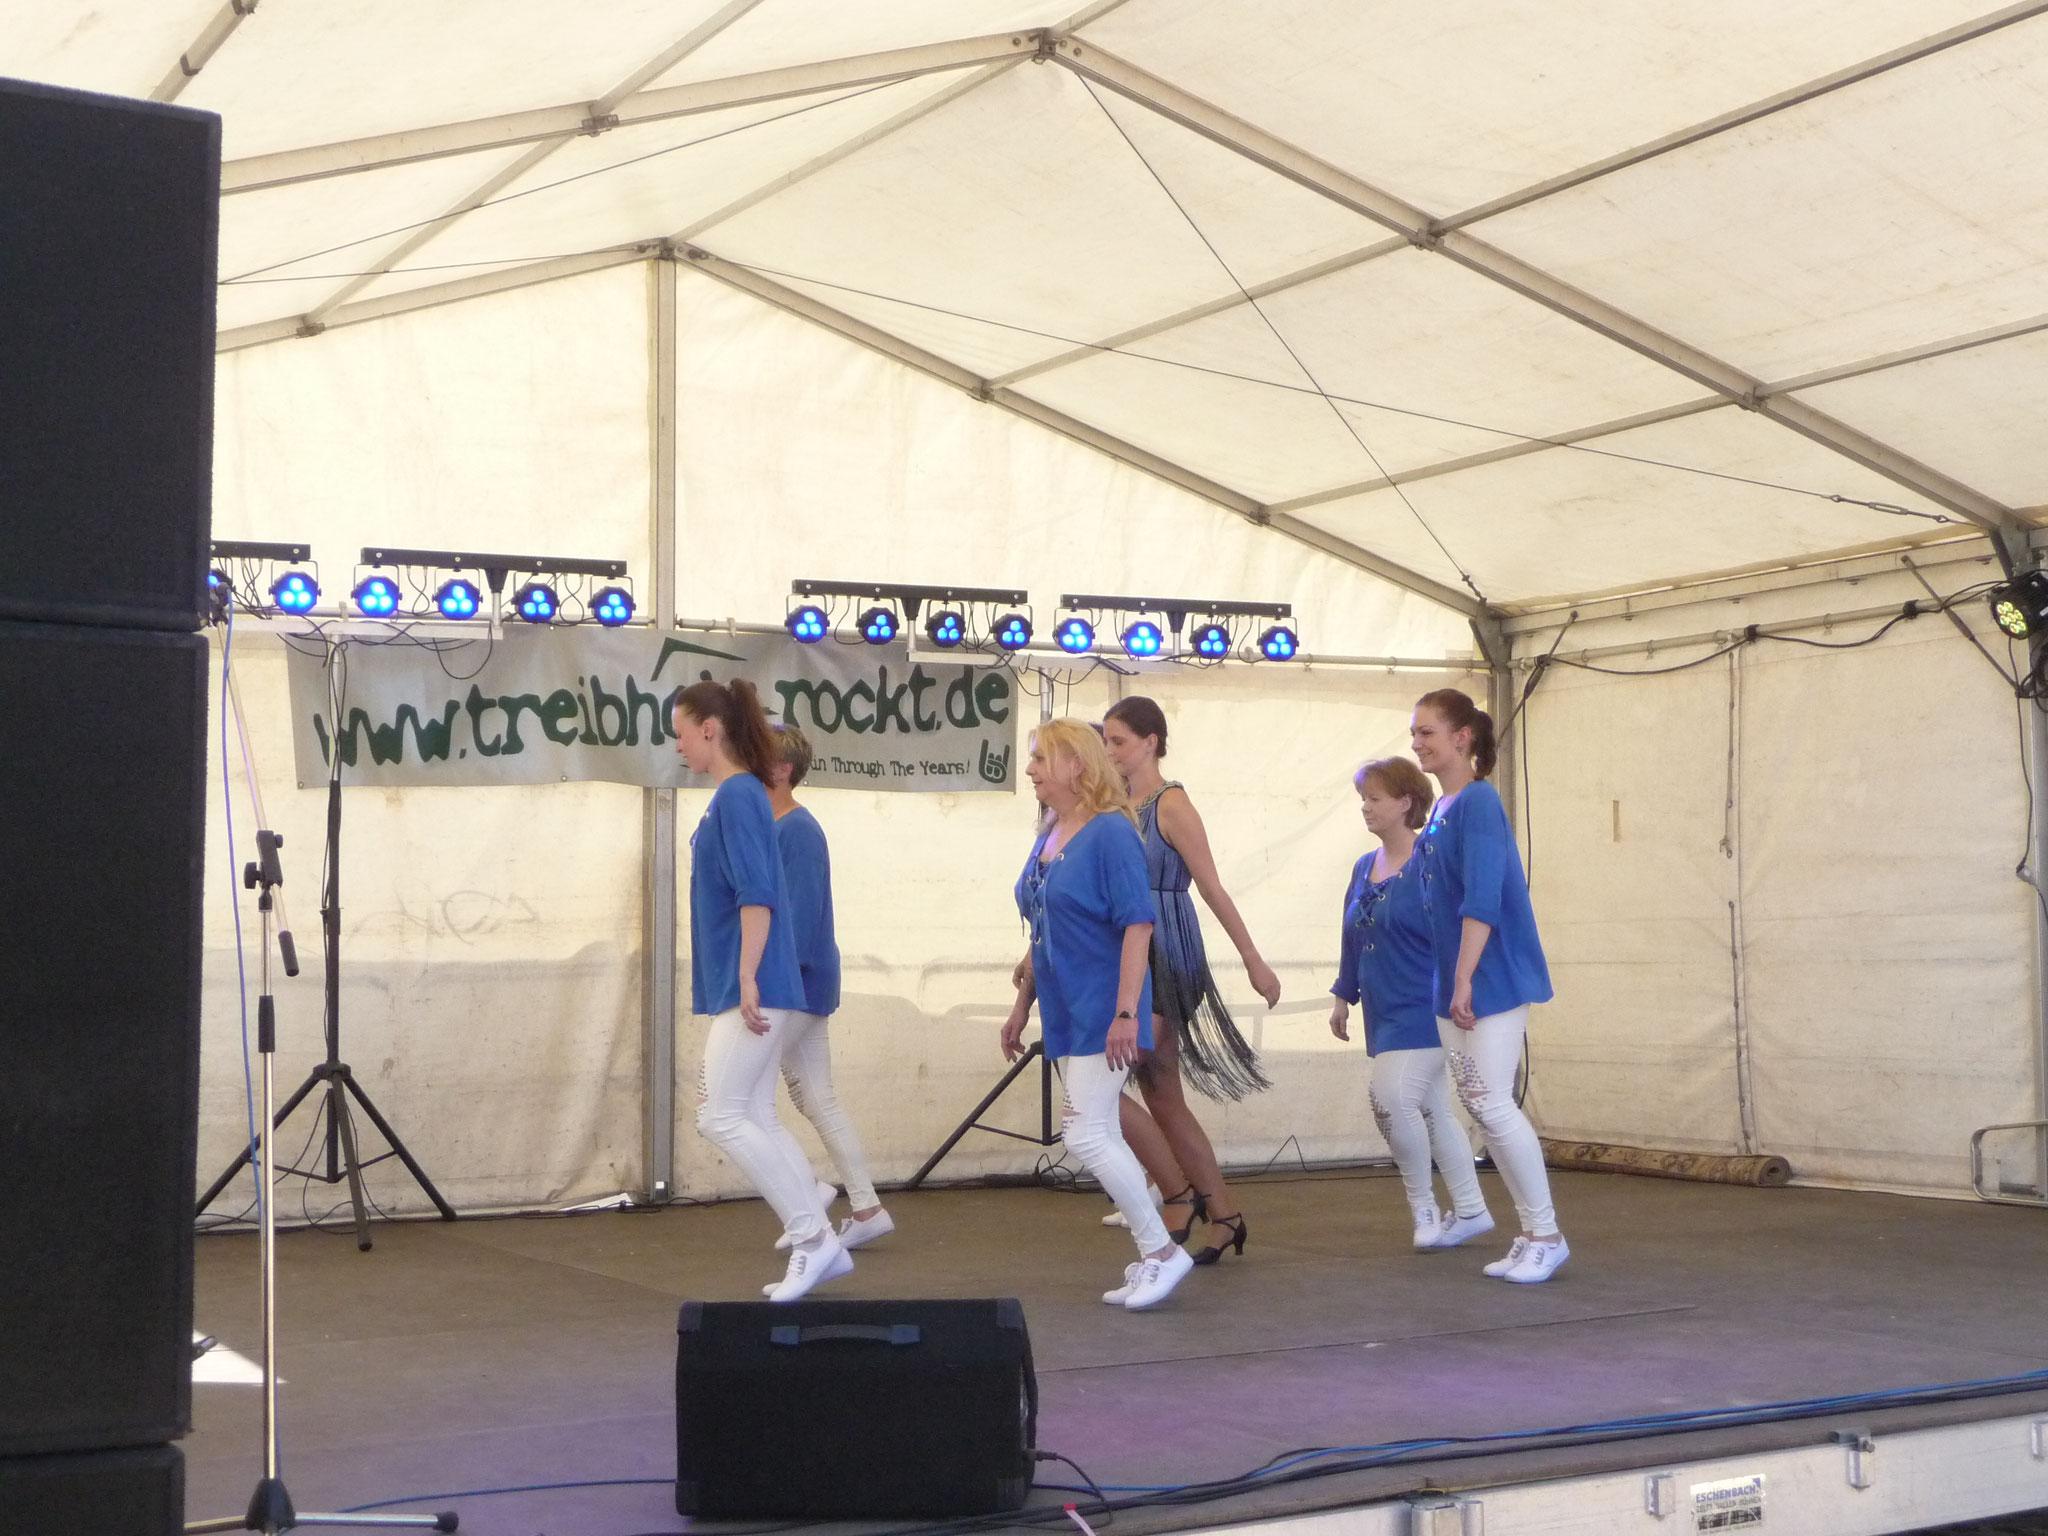 CarMa Line Dance Fans - Fun Kurs - Swing Medley